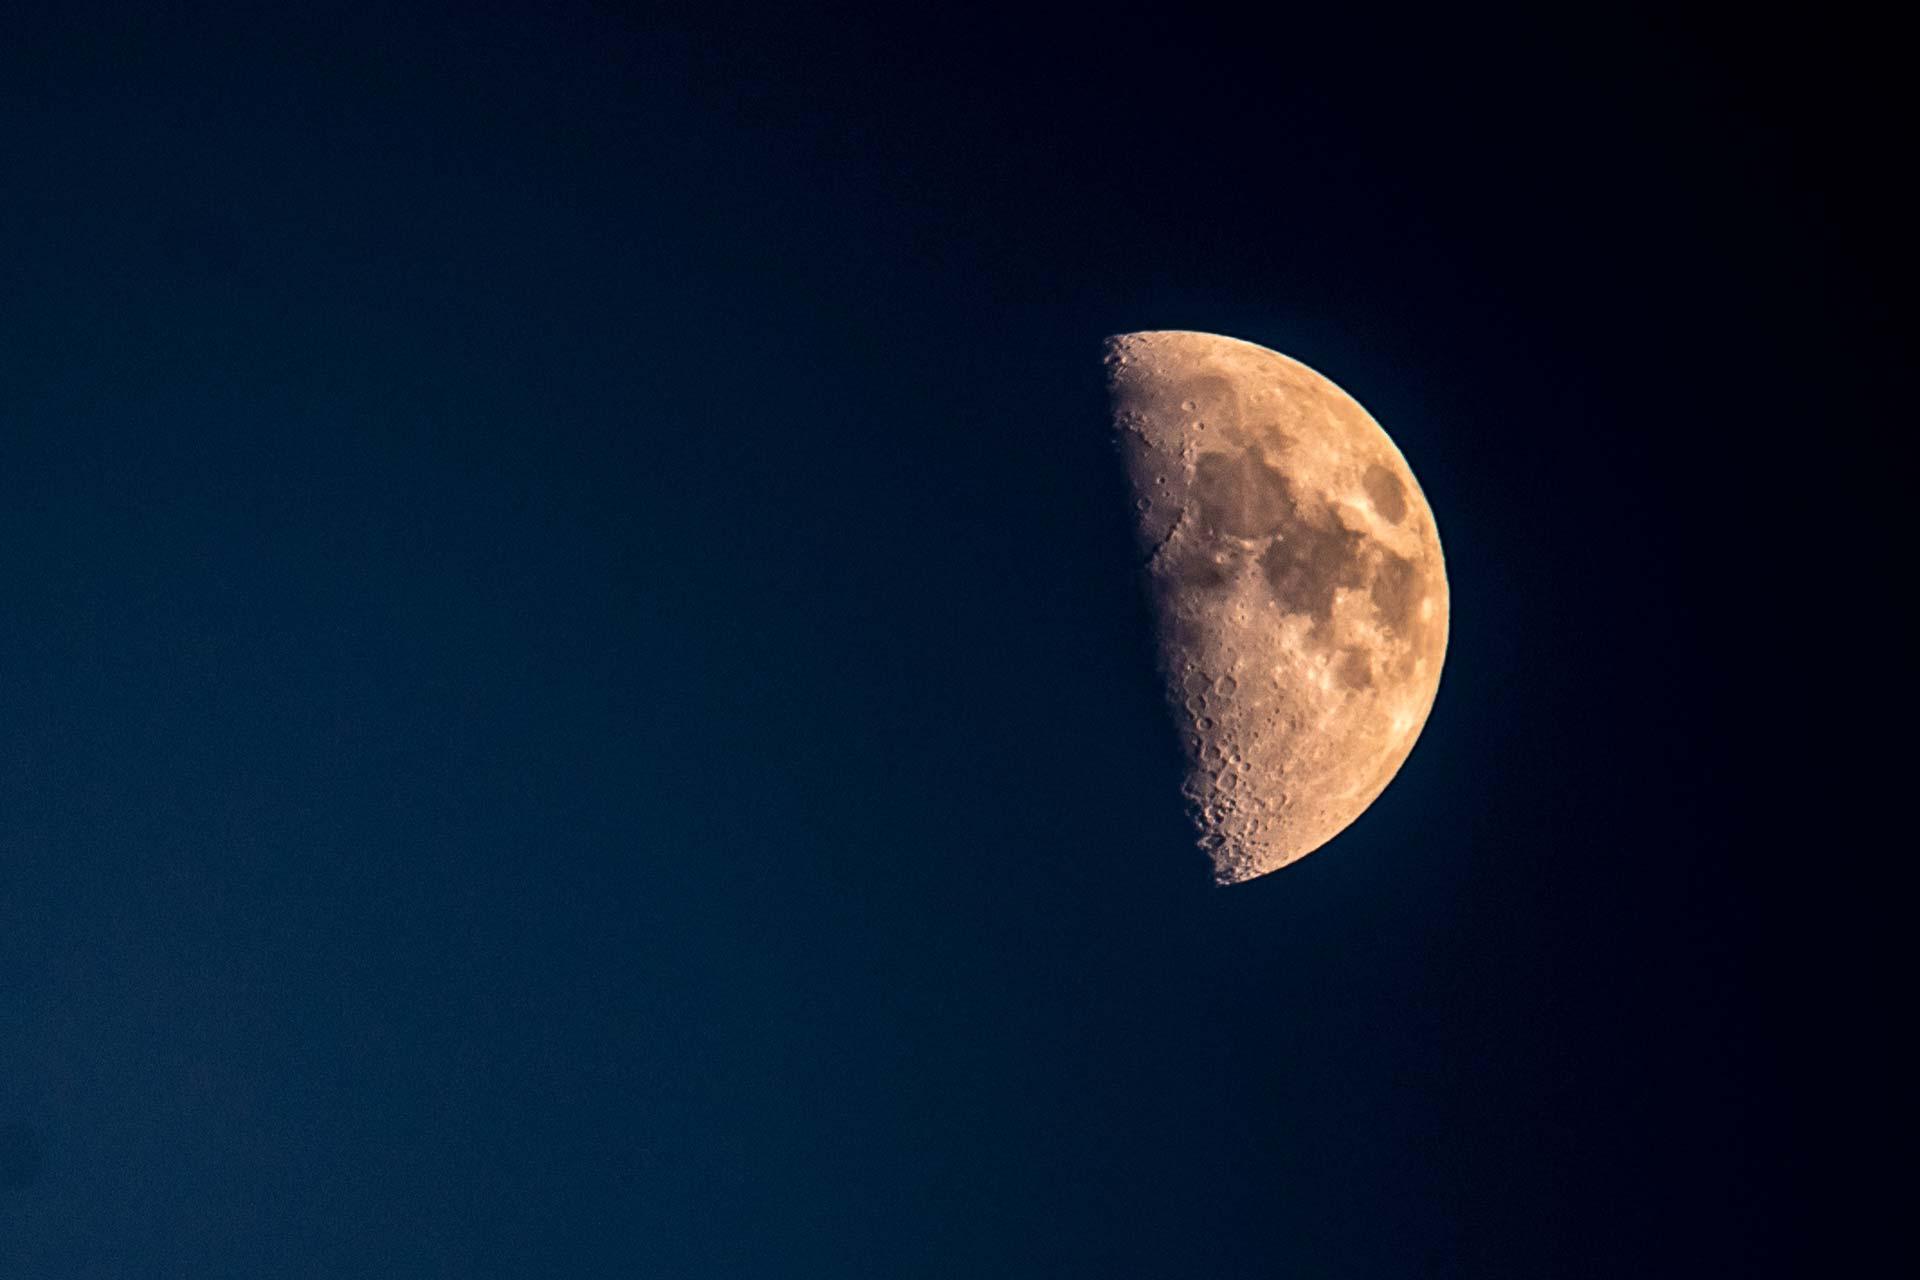 Nachtfotografie - Halbmond